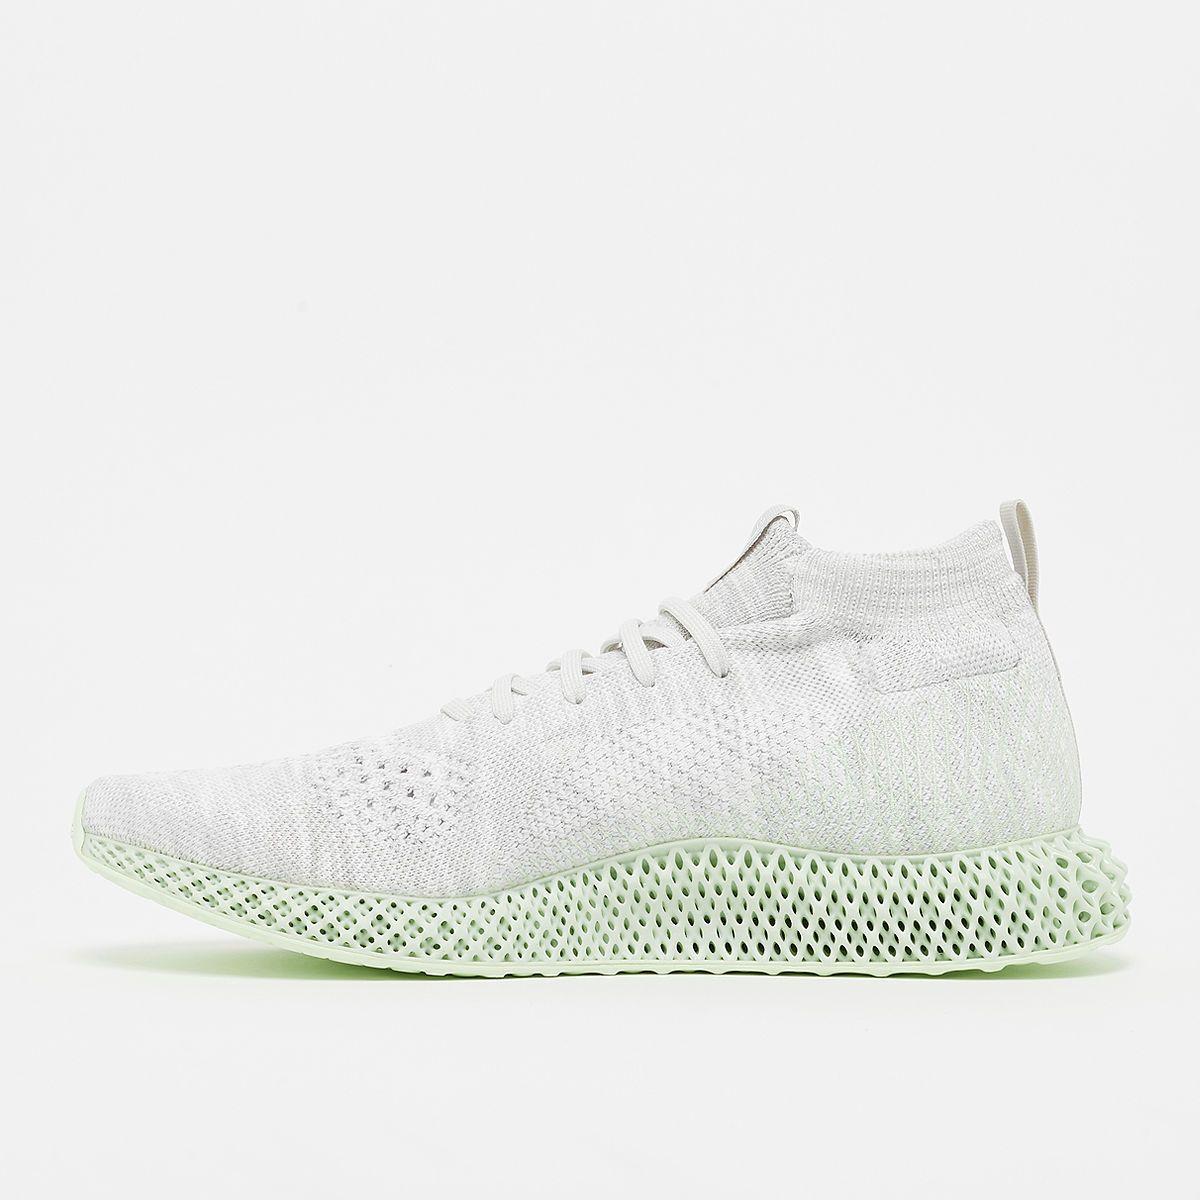 ? adidas Consortium Runner Mid 4D   Sneaker   Adidas und